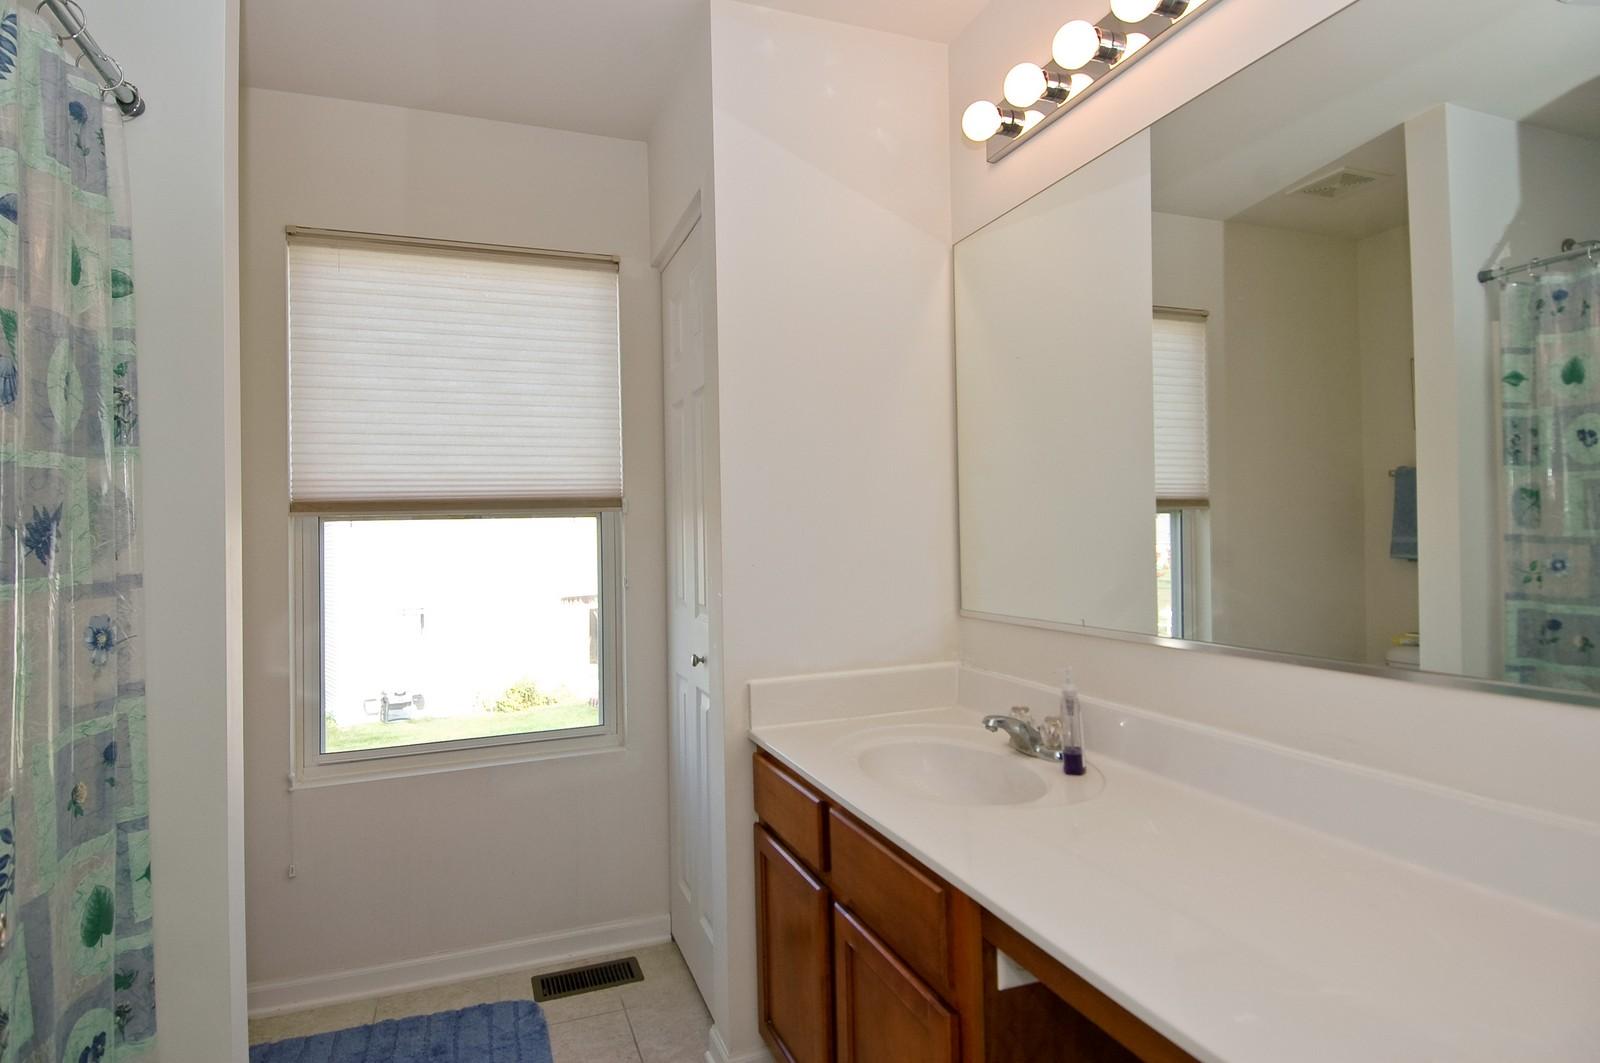 Real Estate Photography - 1872 Yasgur Dr, Woodstock, IL, 60098 - Master Bathroom